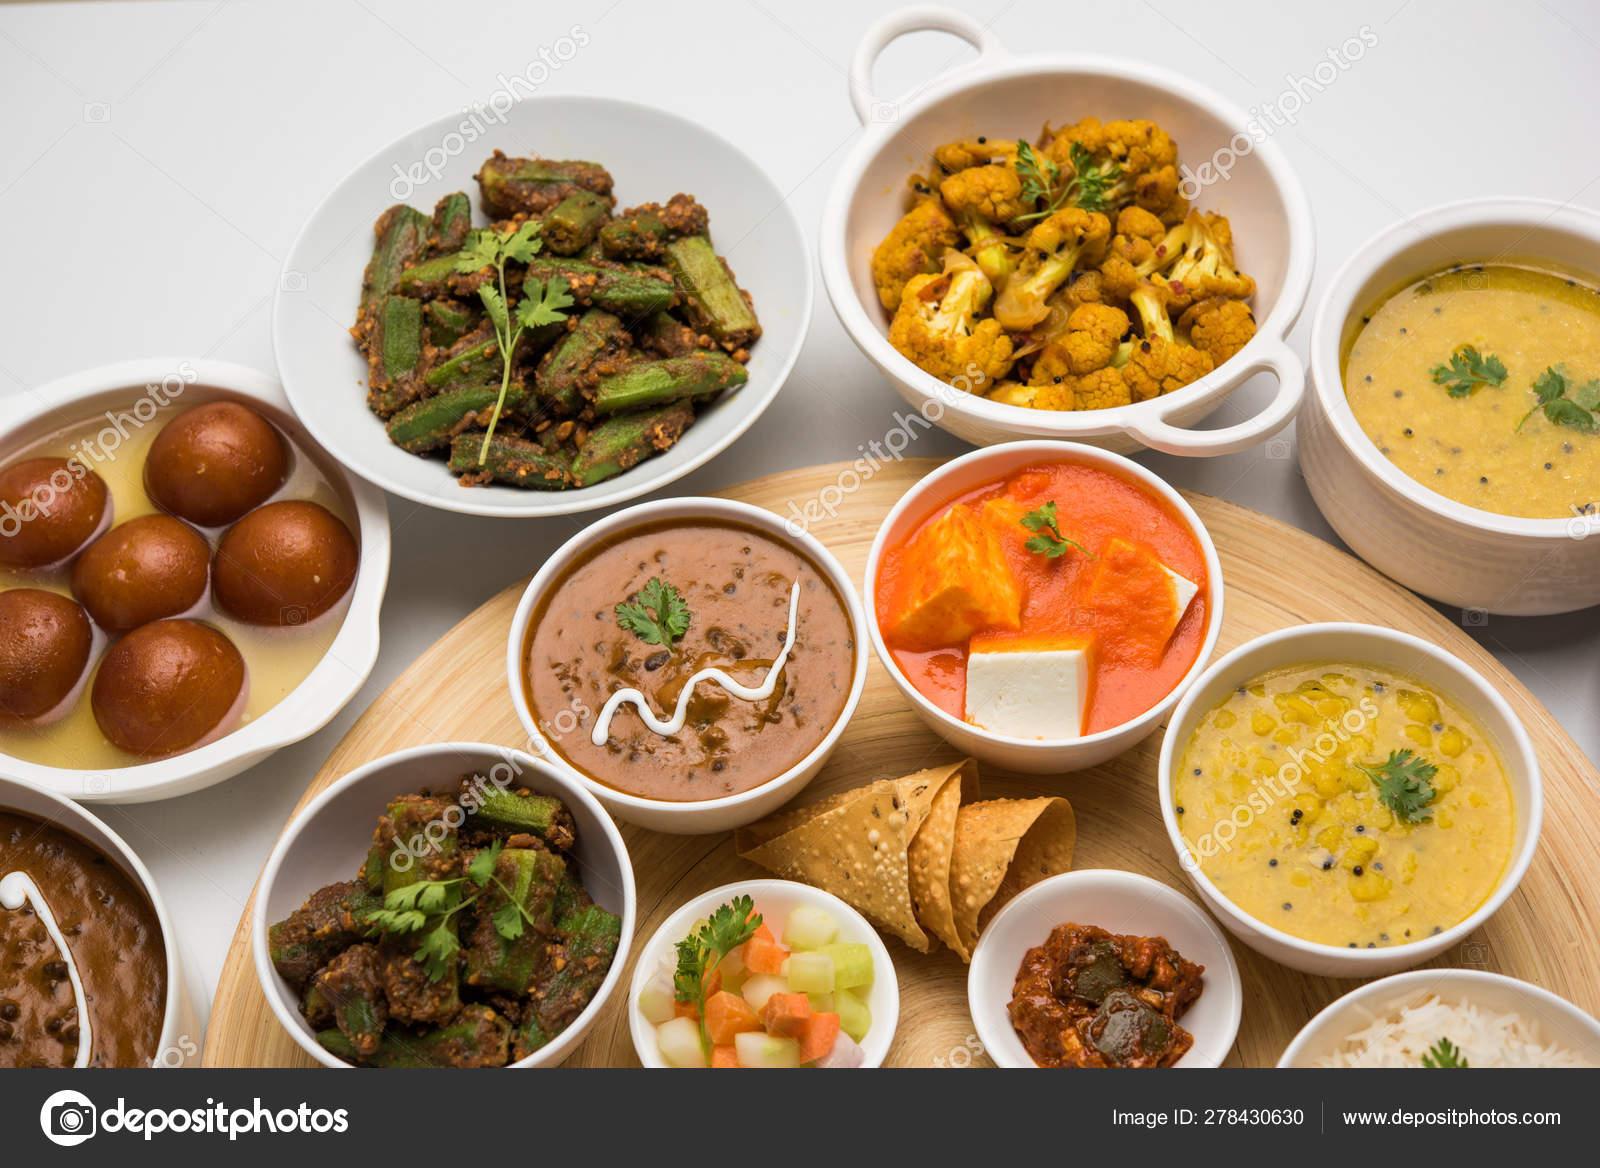 Indian Food Platter Hindu Veg Thali Selective Focus Stock Photo Image By C Arundhati Callistainteriors In 278430630